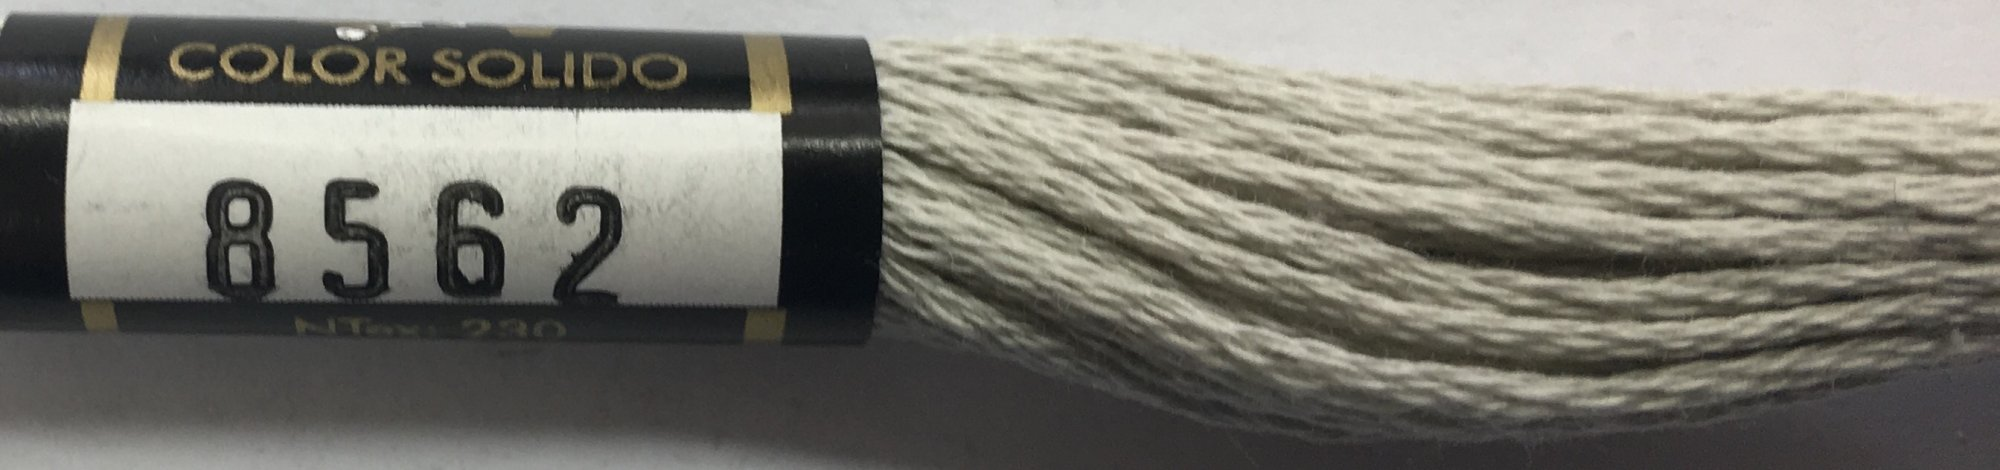 F8562 Presencia 100% Mercerized Finca Cotton 6 ply Embroidery Floss 8 meter skein